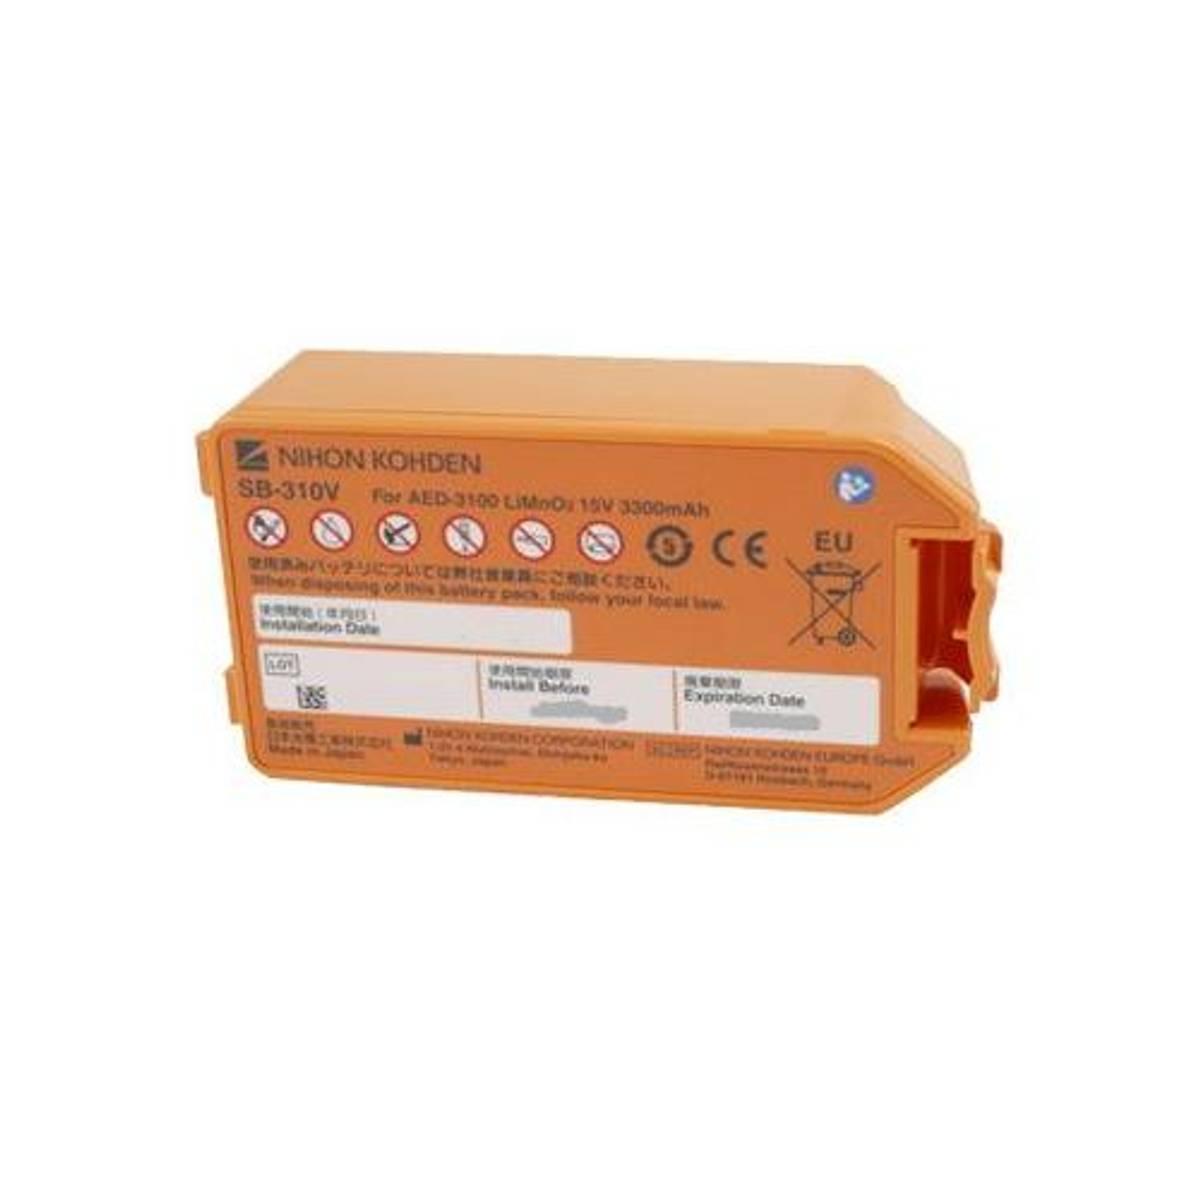 Nihon Kohden Cardiolife AED 3100 batteri